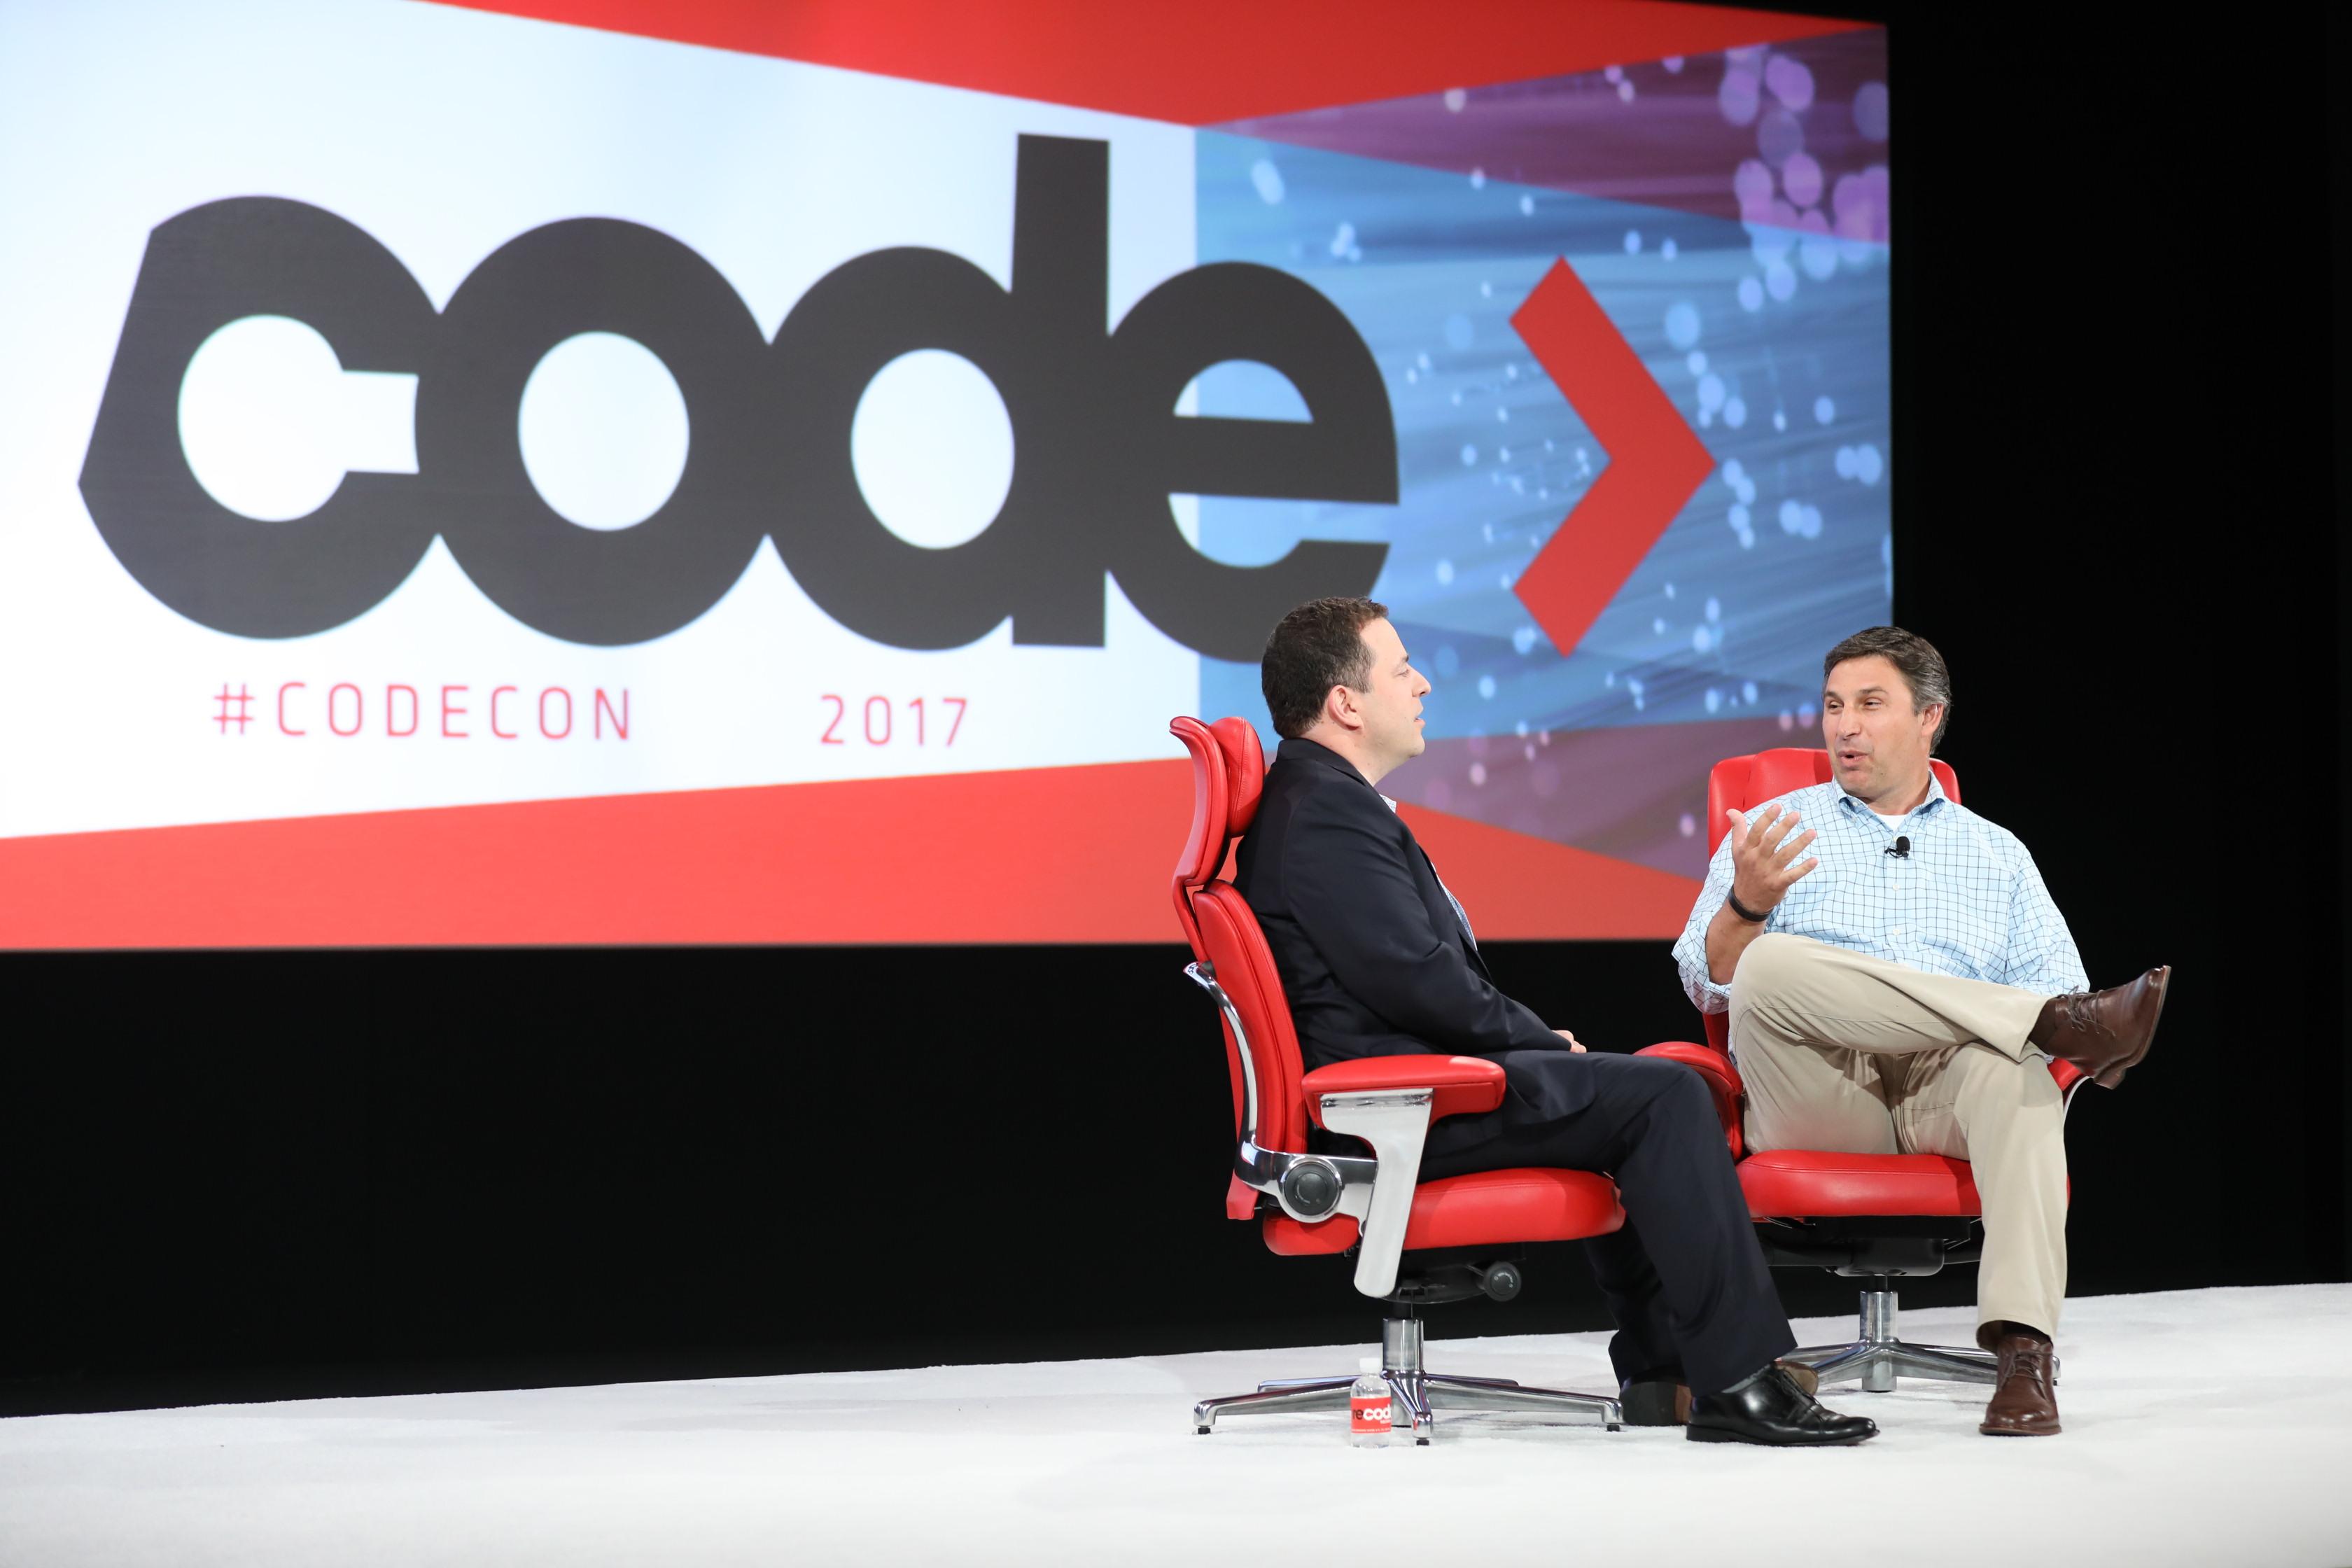 Anthony Noto, Twitter, Code 2017